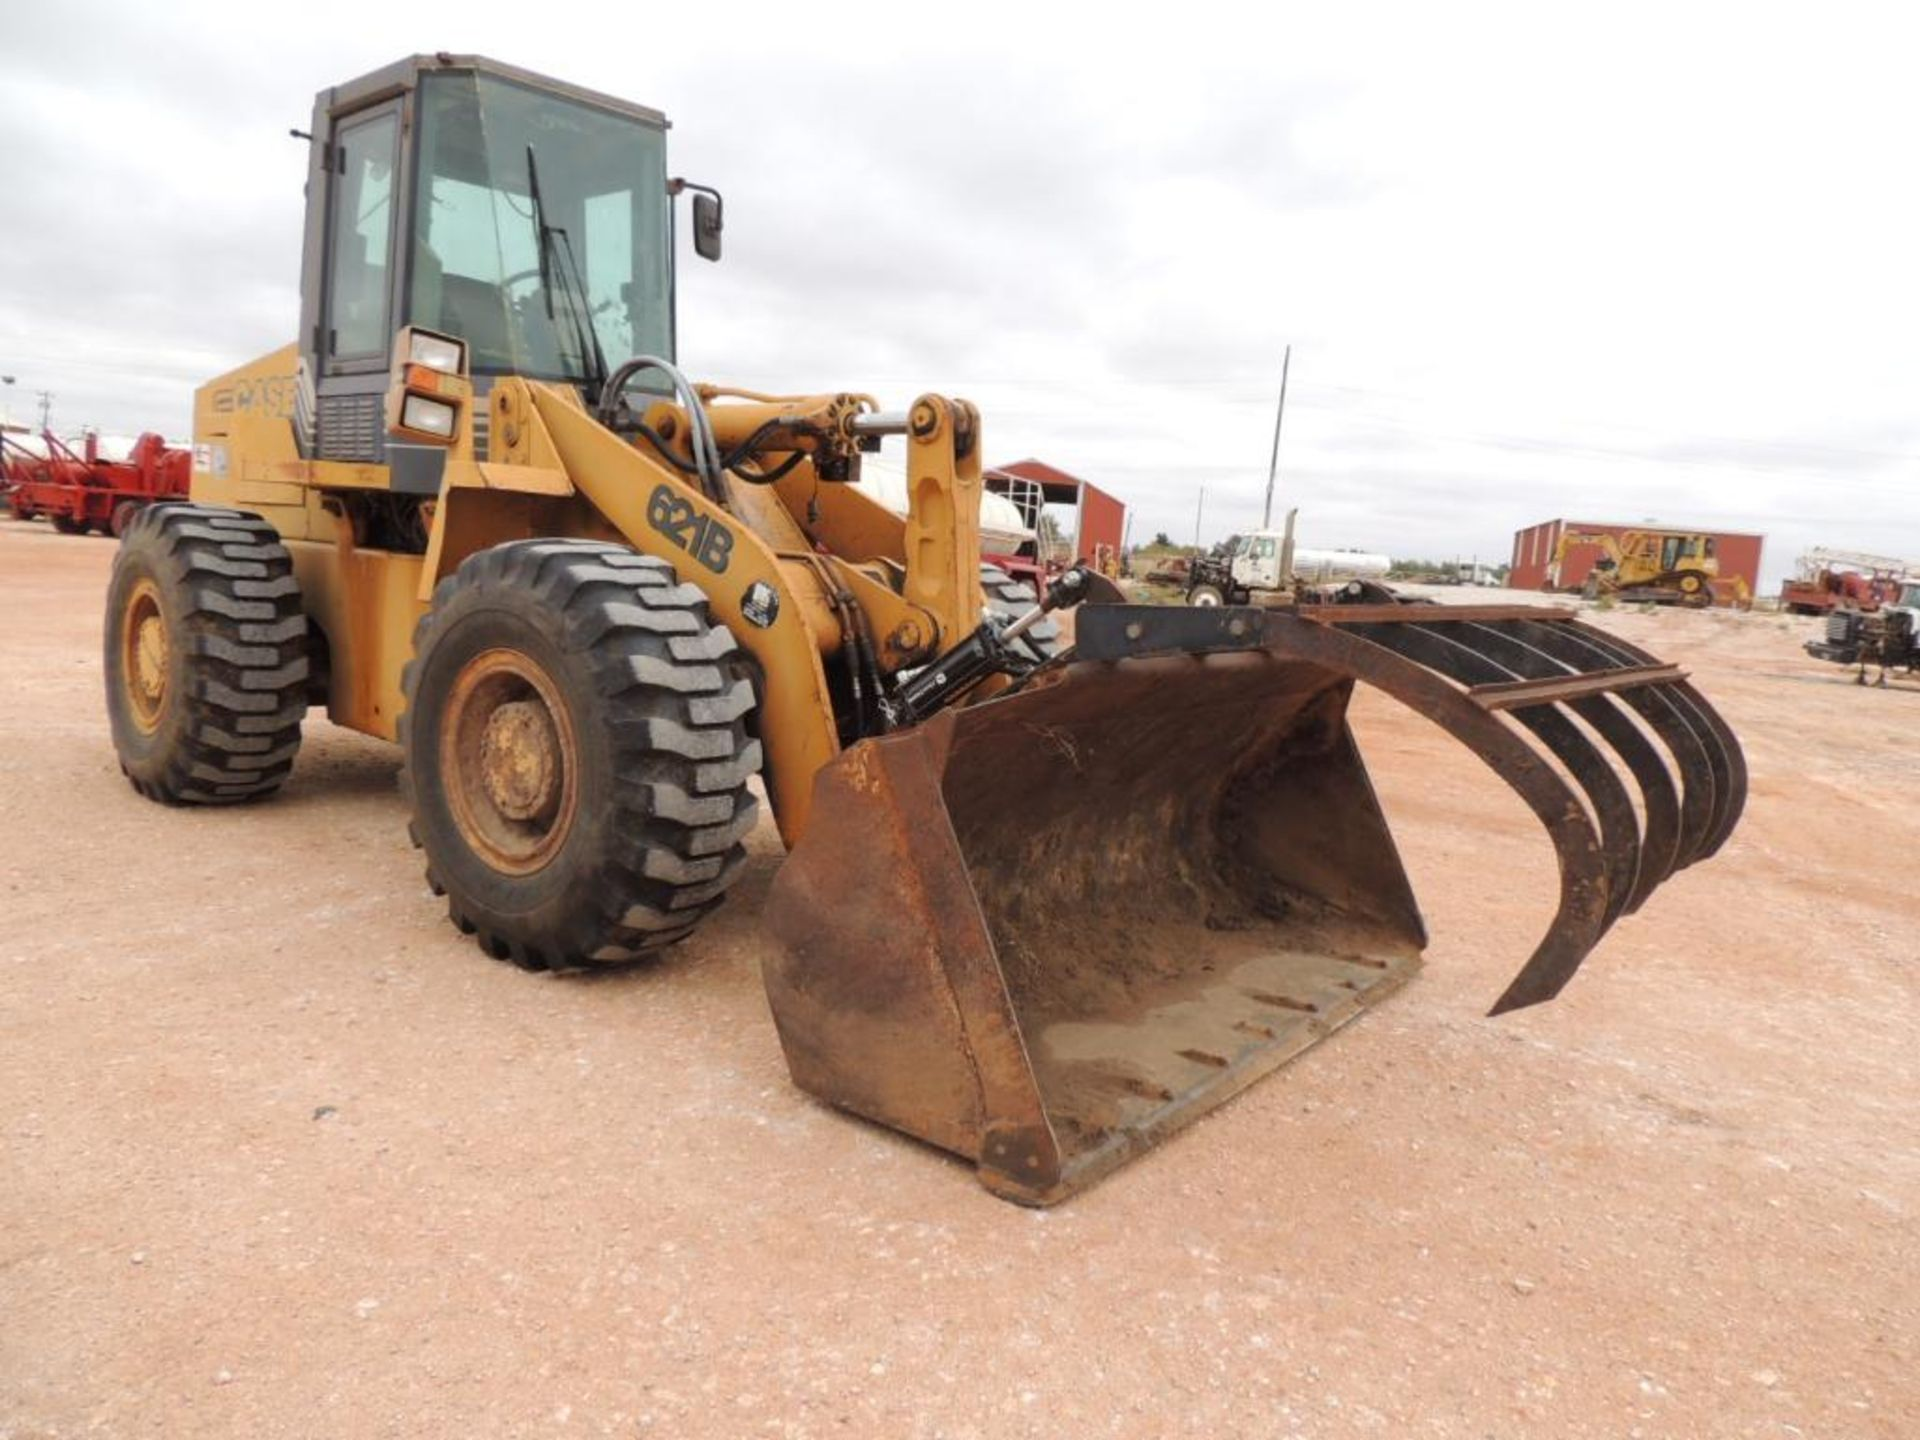 Case 621B Wheel Loader, 100 in. GP Bucket, Grapple, Brake Pressure Low, Transmission Will Not - Image 2 of 5